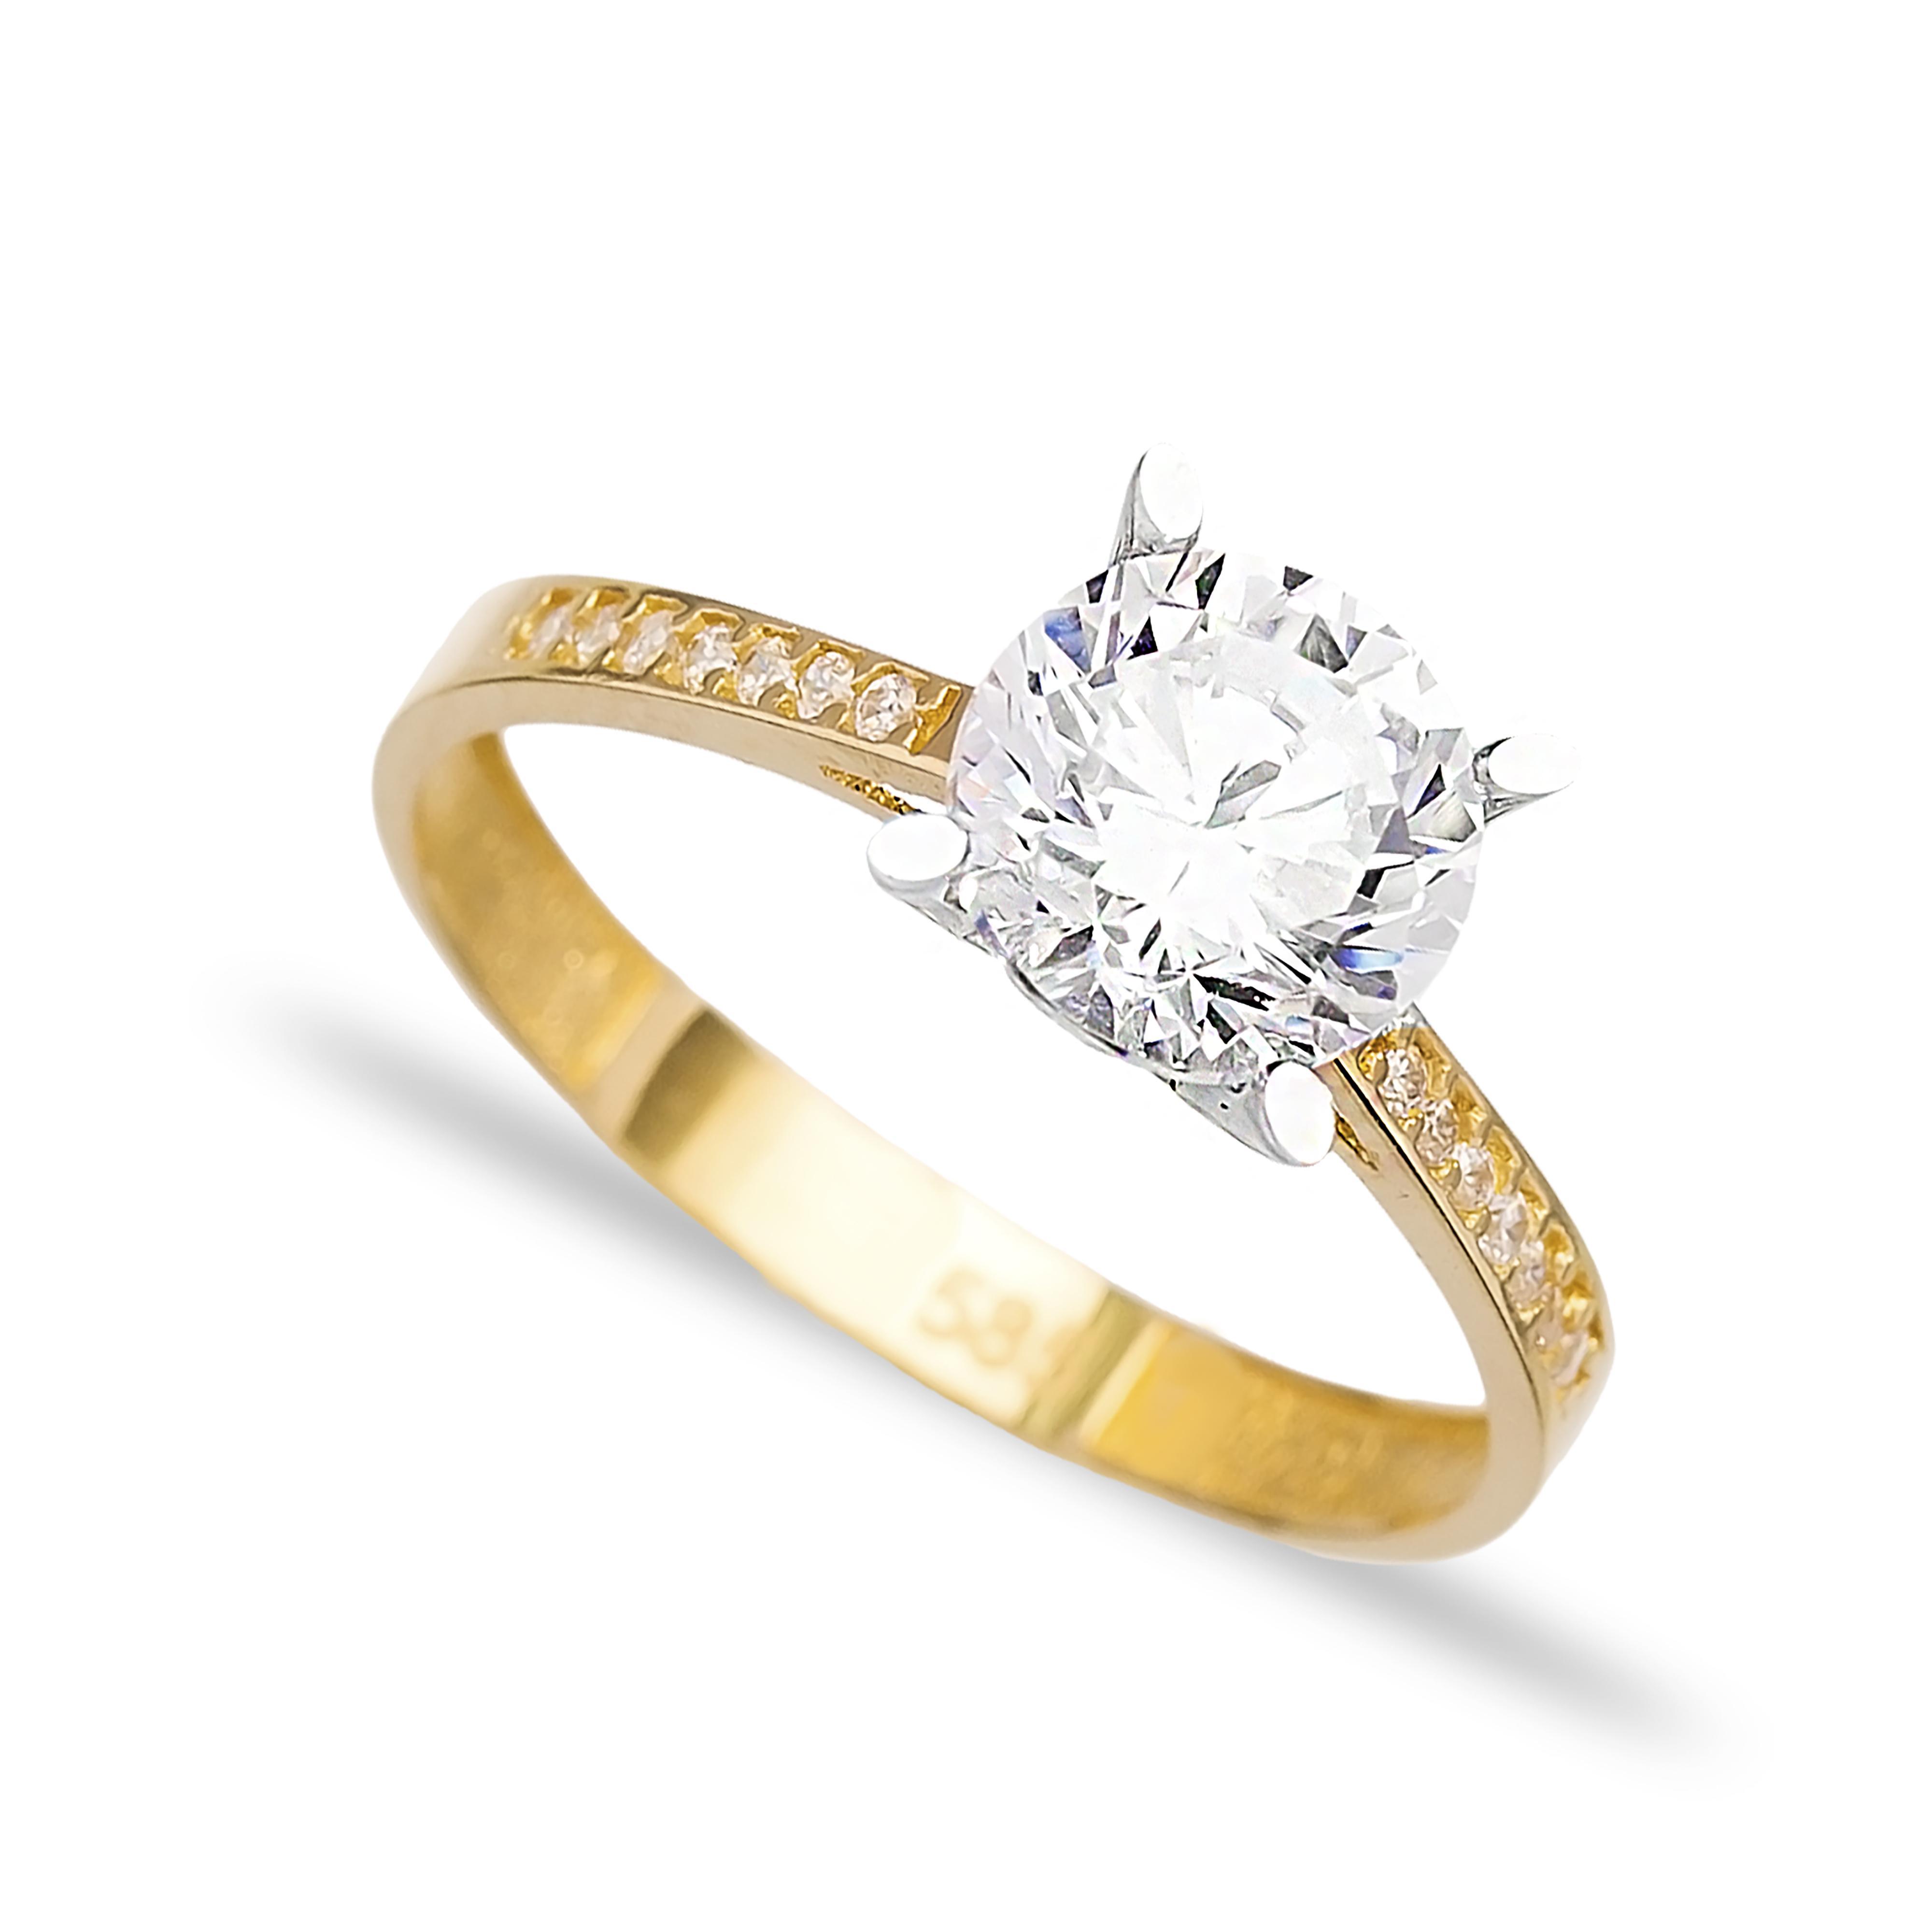 Engagement Solitaire 14 Karat Gold Zirconia 7.5 mm Wholesale Handmade Turkish Jewelry